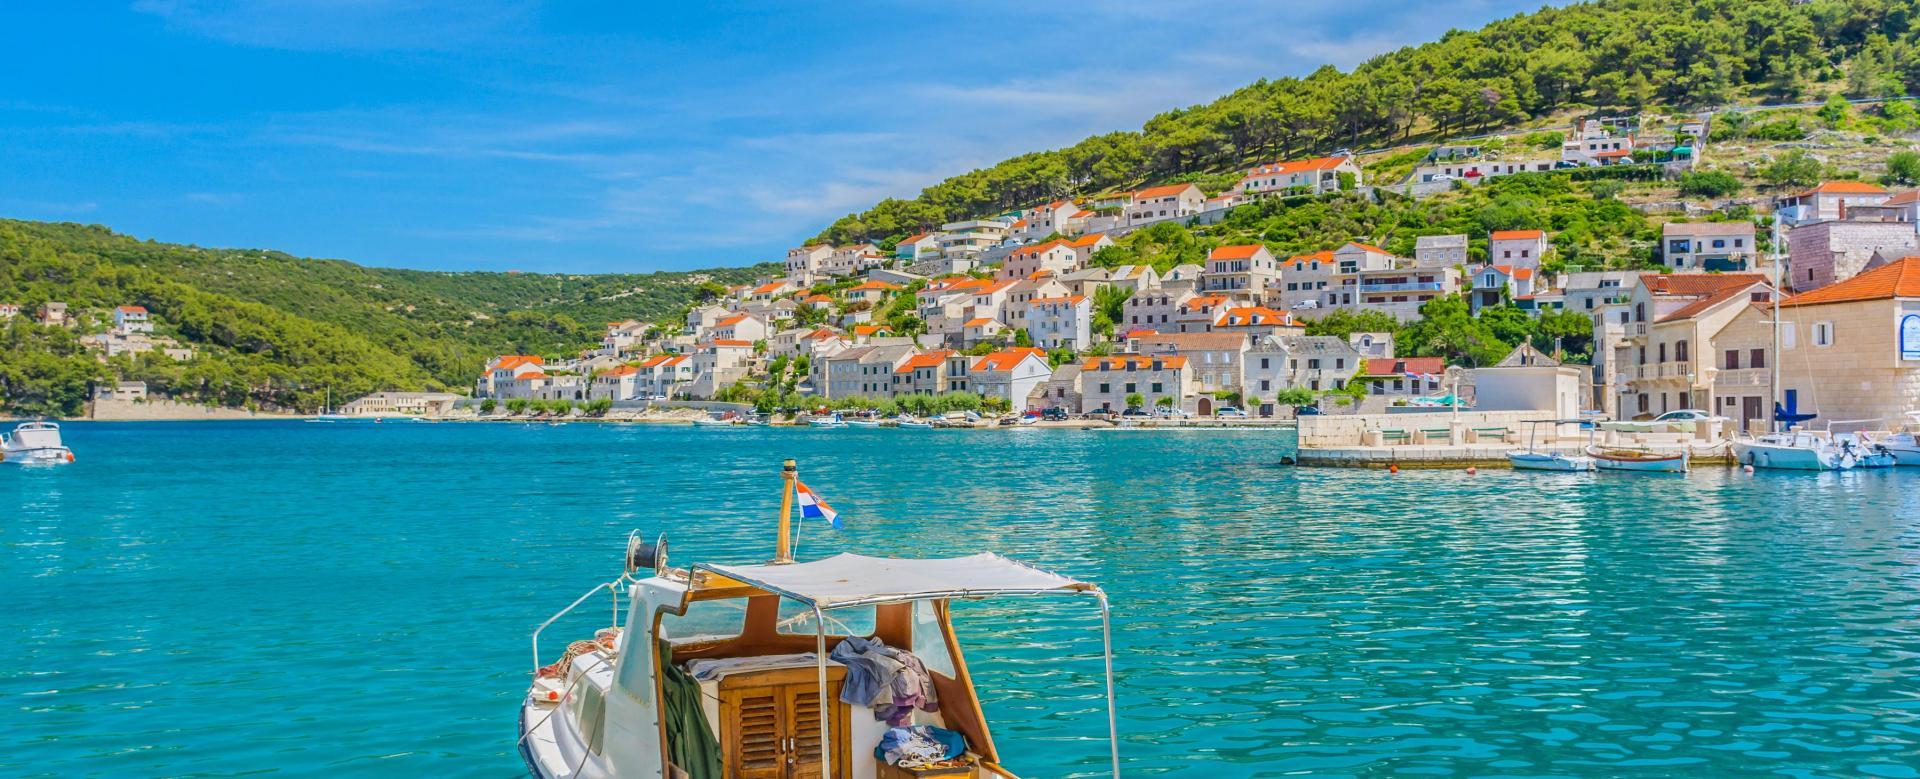 Voyage à pied : Balade en croatie